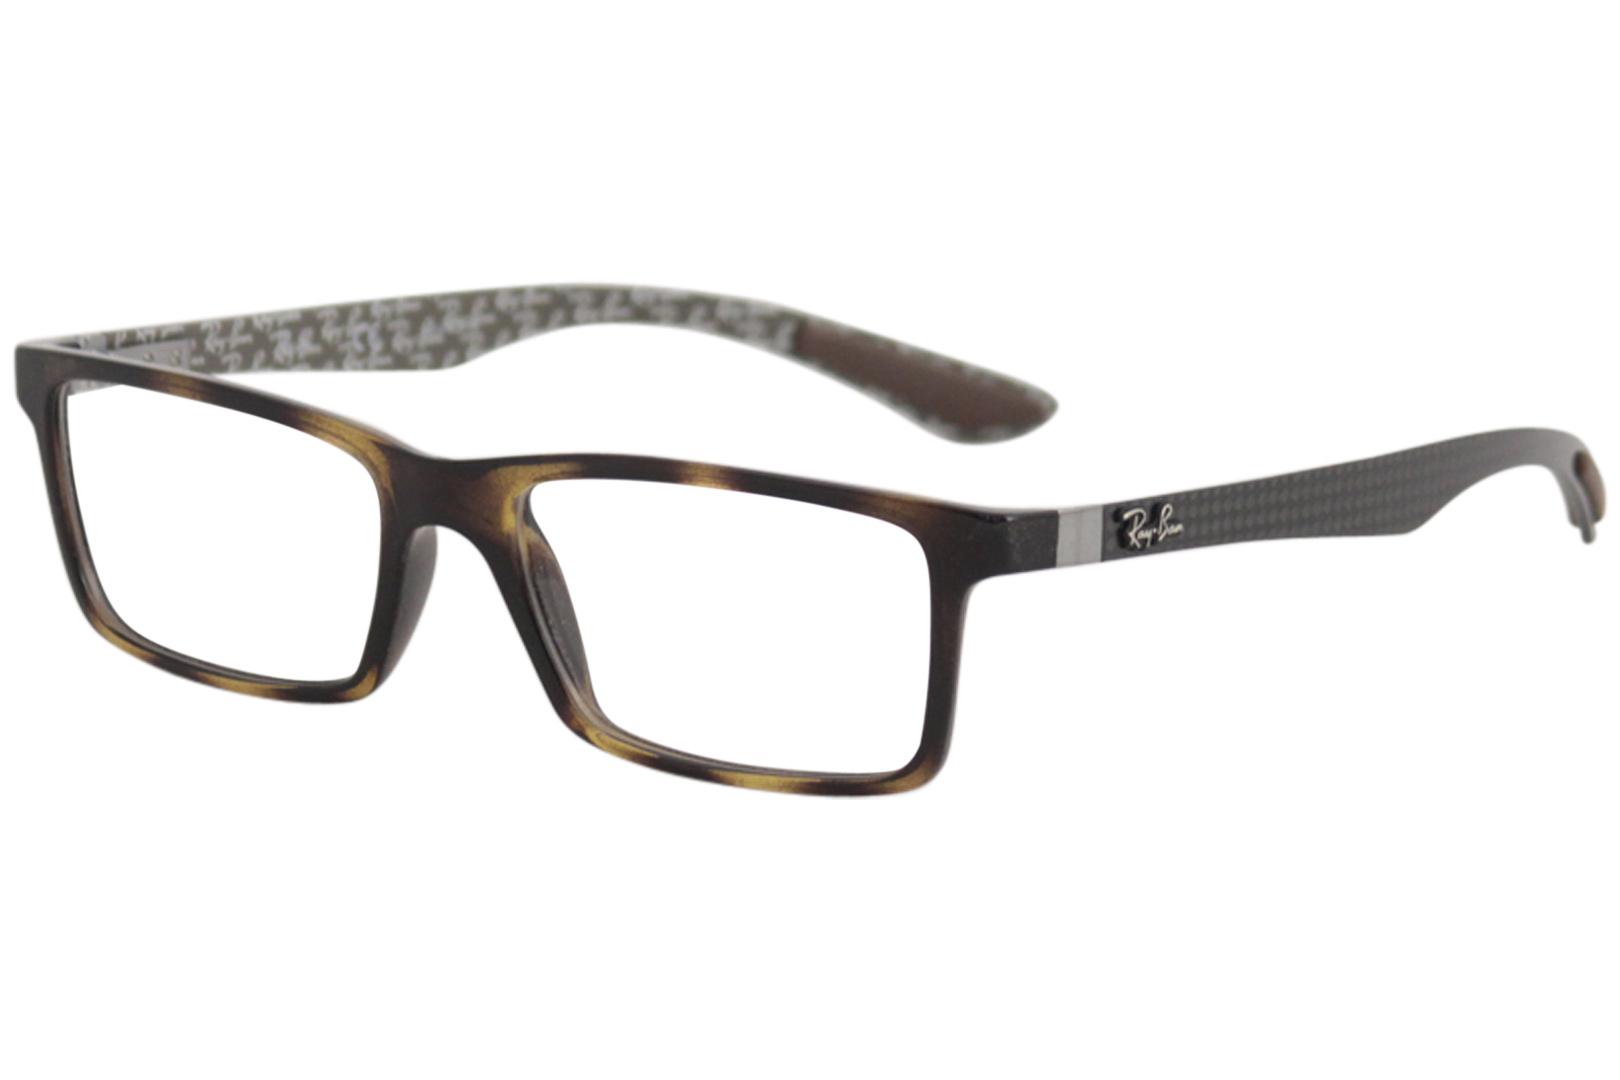 ba9964de5b Ray Ban Tech Eyeglasses RB8901 RX 8901 RayBan 5846 Havana Optical ...